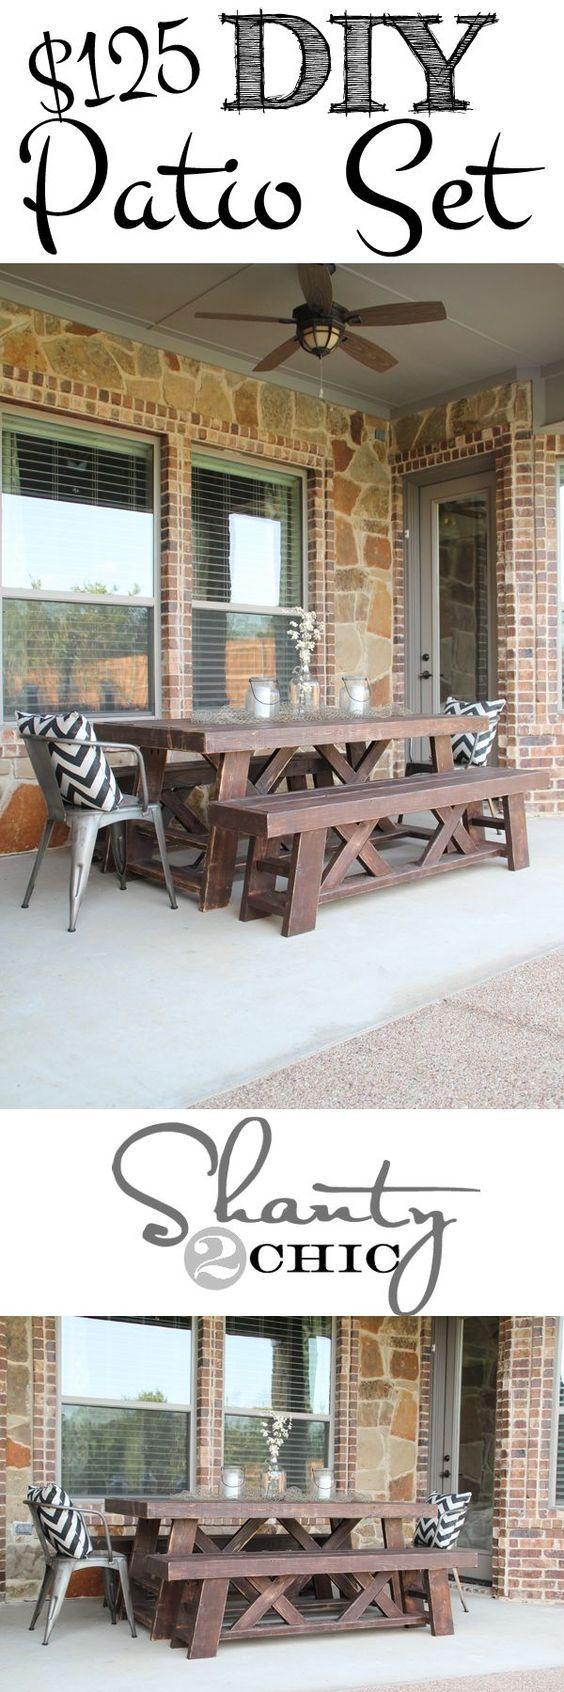 best yard ideas images on pinterest gardening entertainment